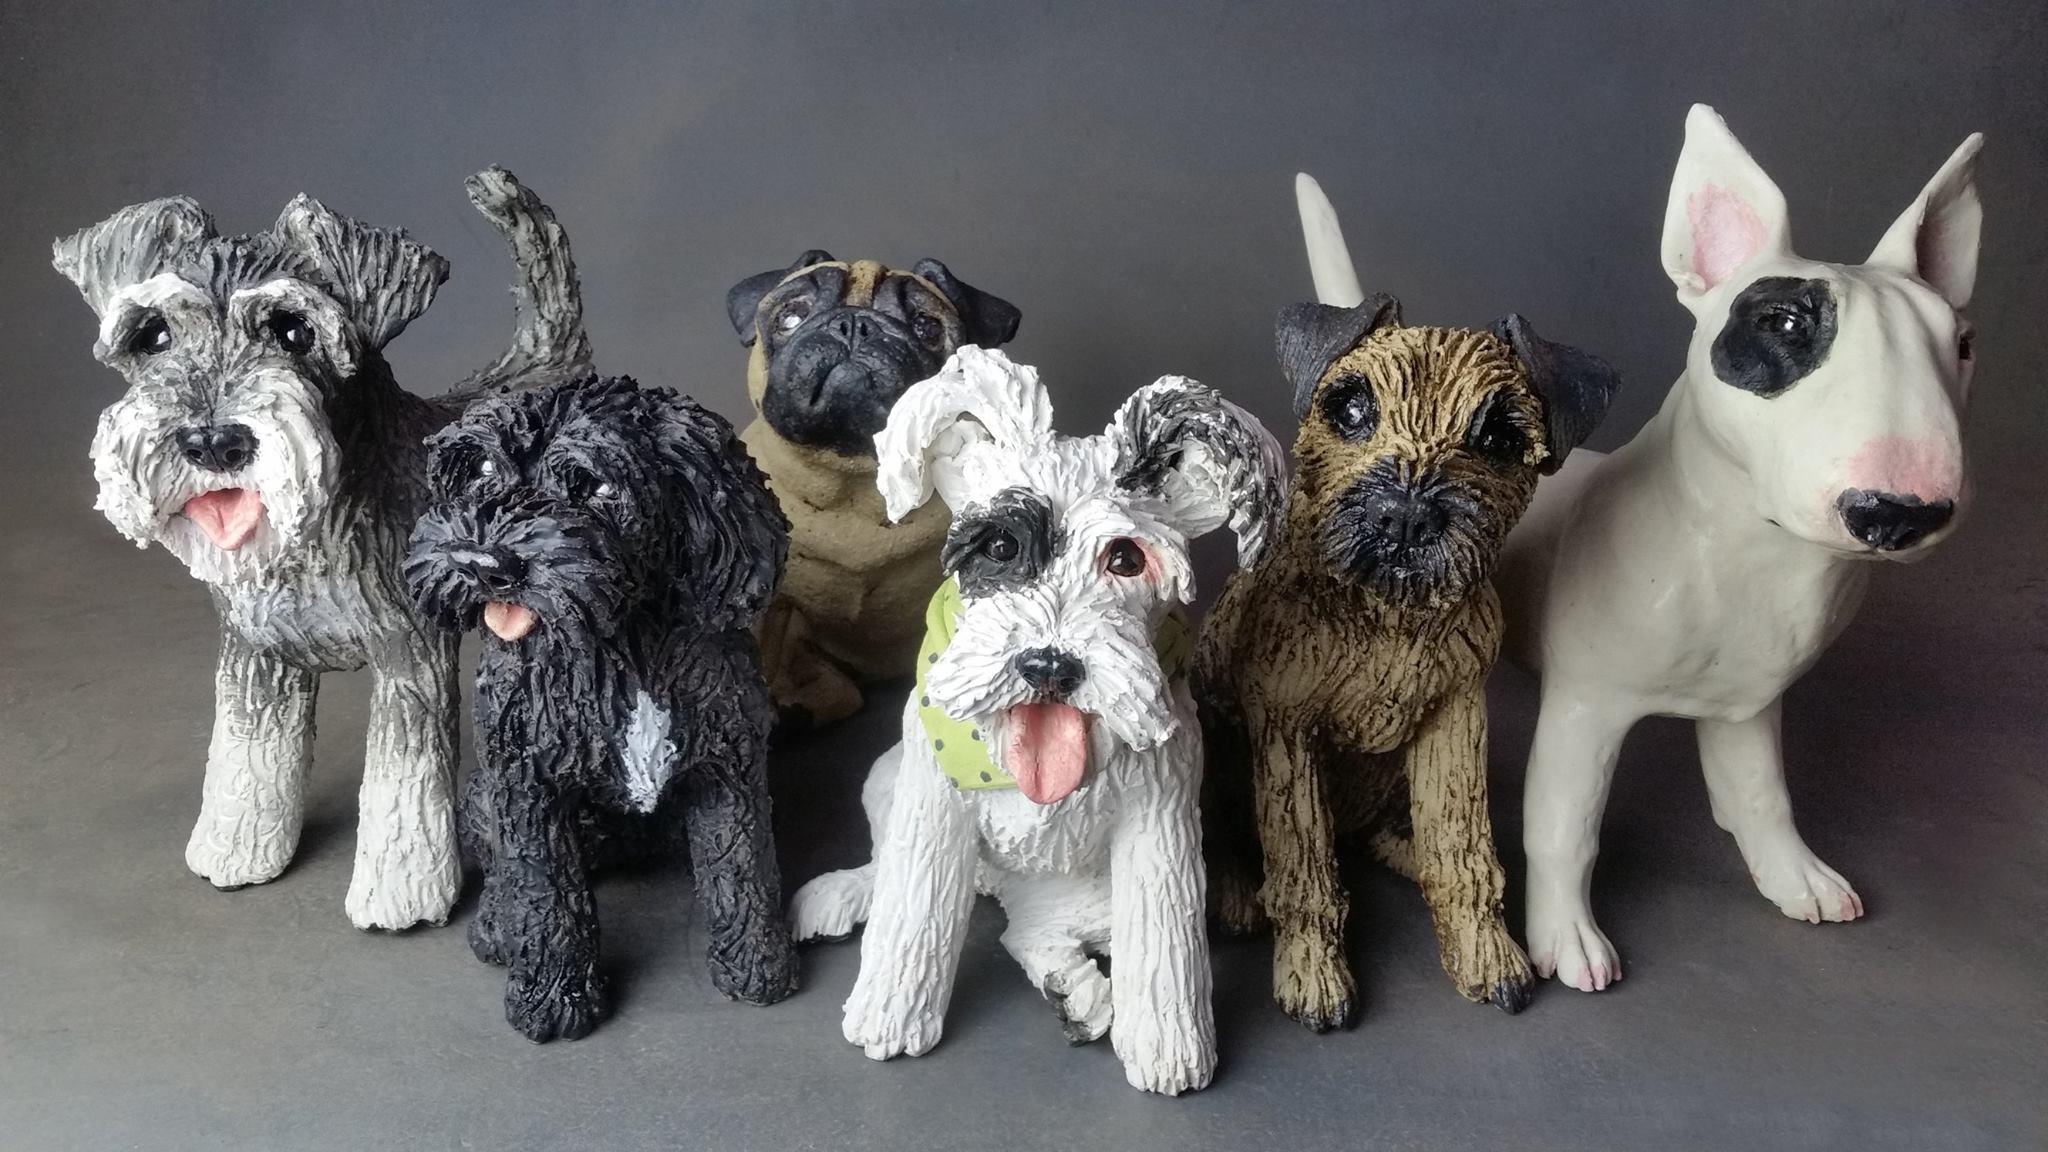 Handmade ceramic dogs from £315